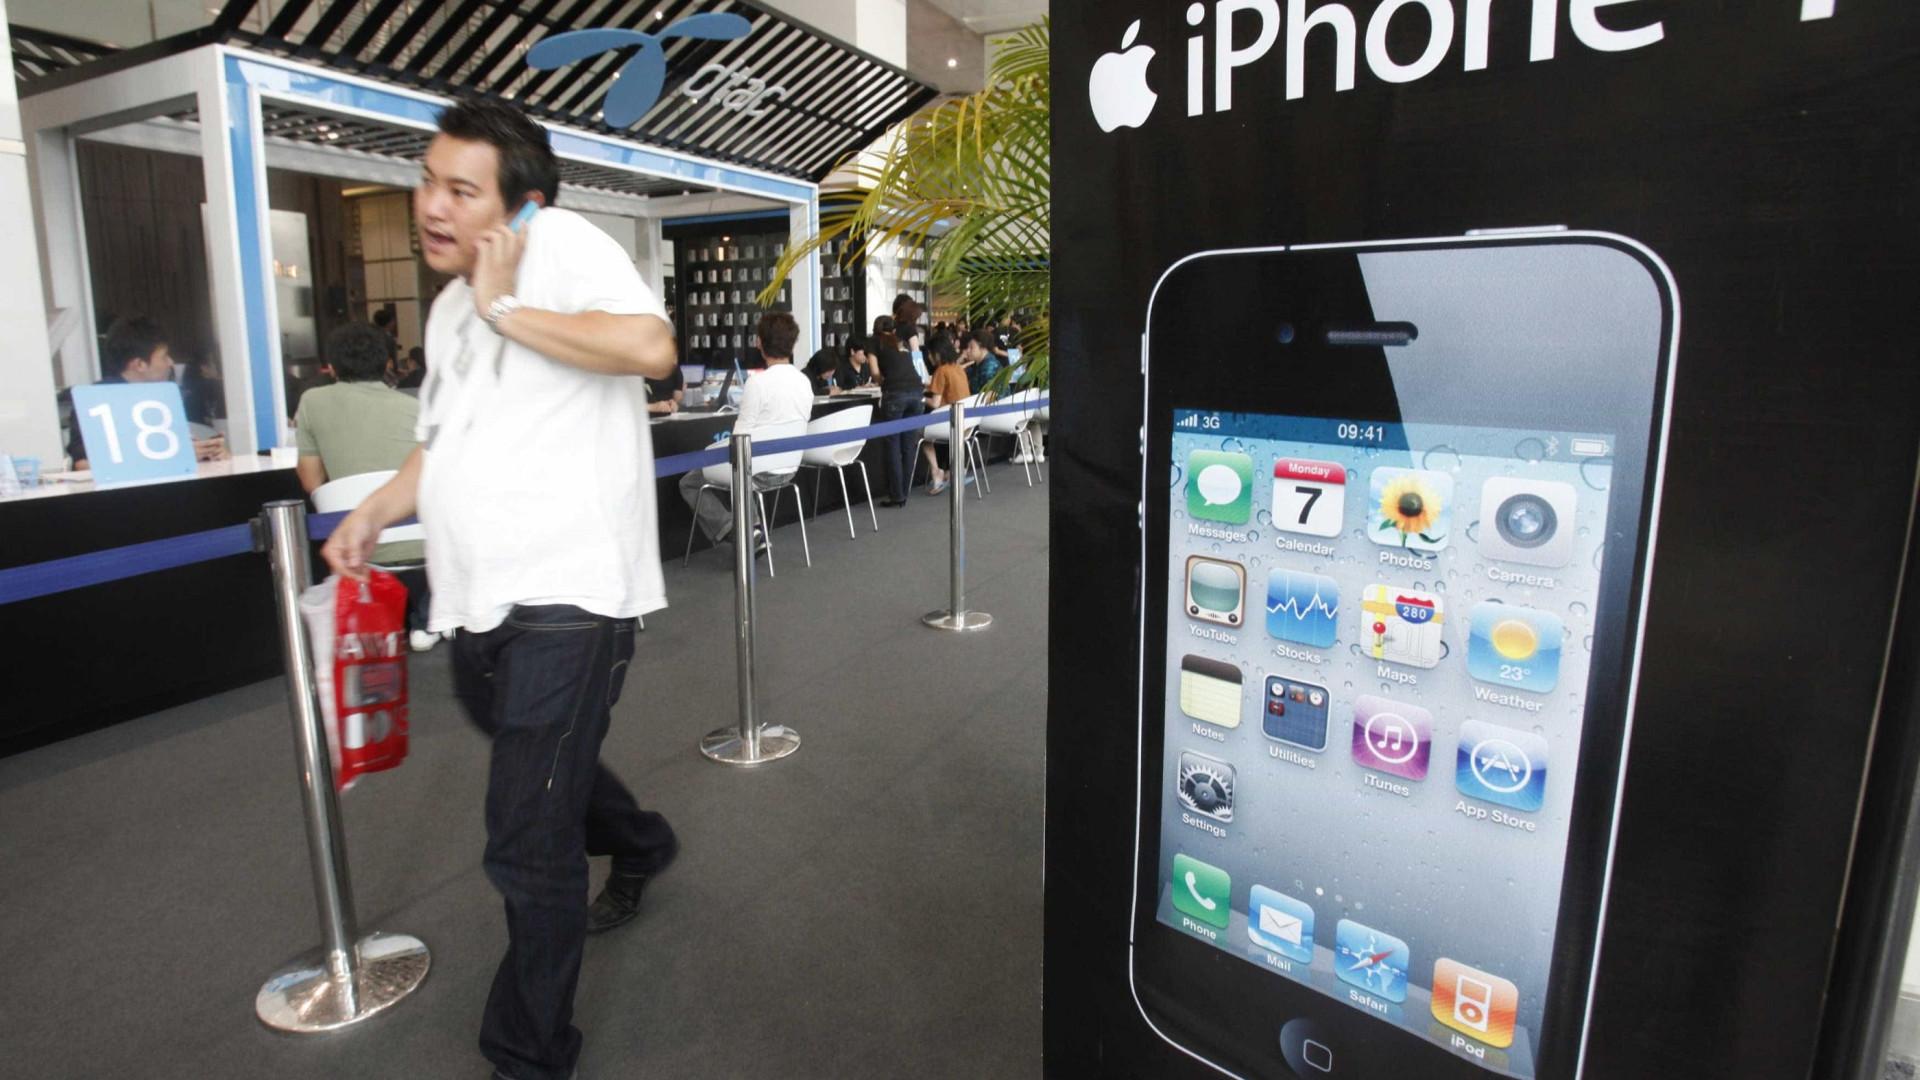 WhatsApp decidiu abandonar os iPhones mais antigos